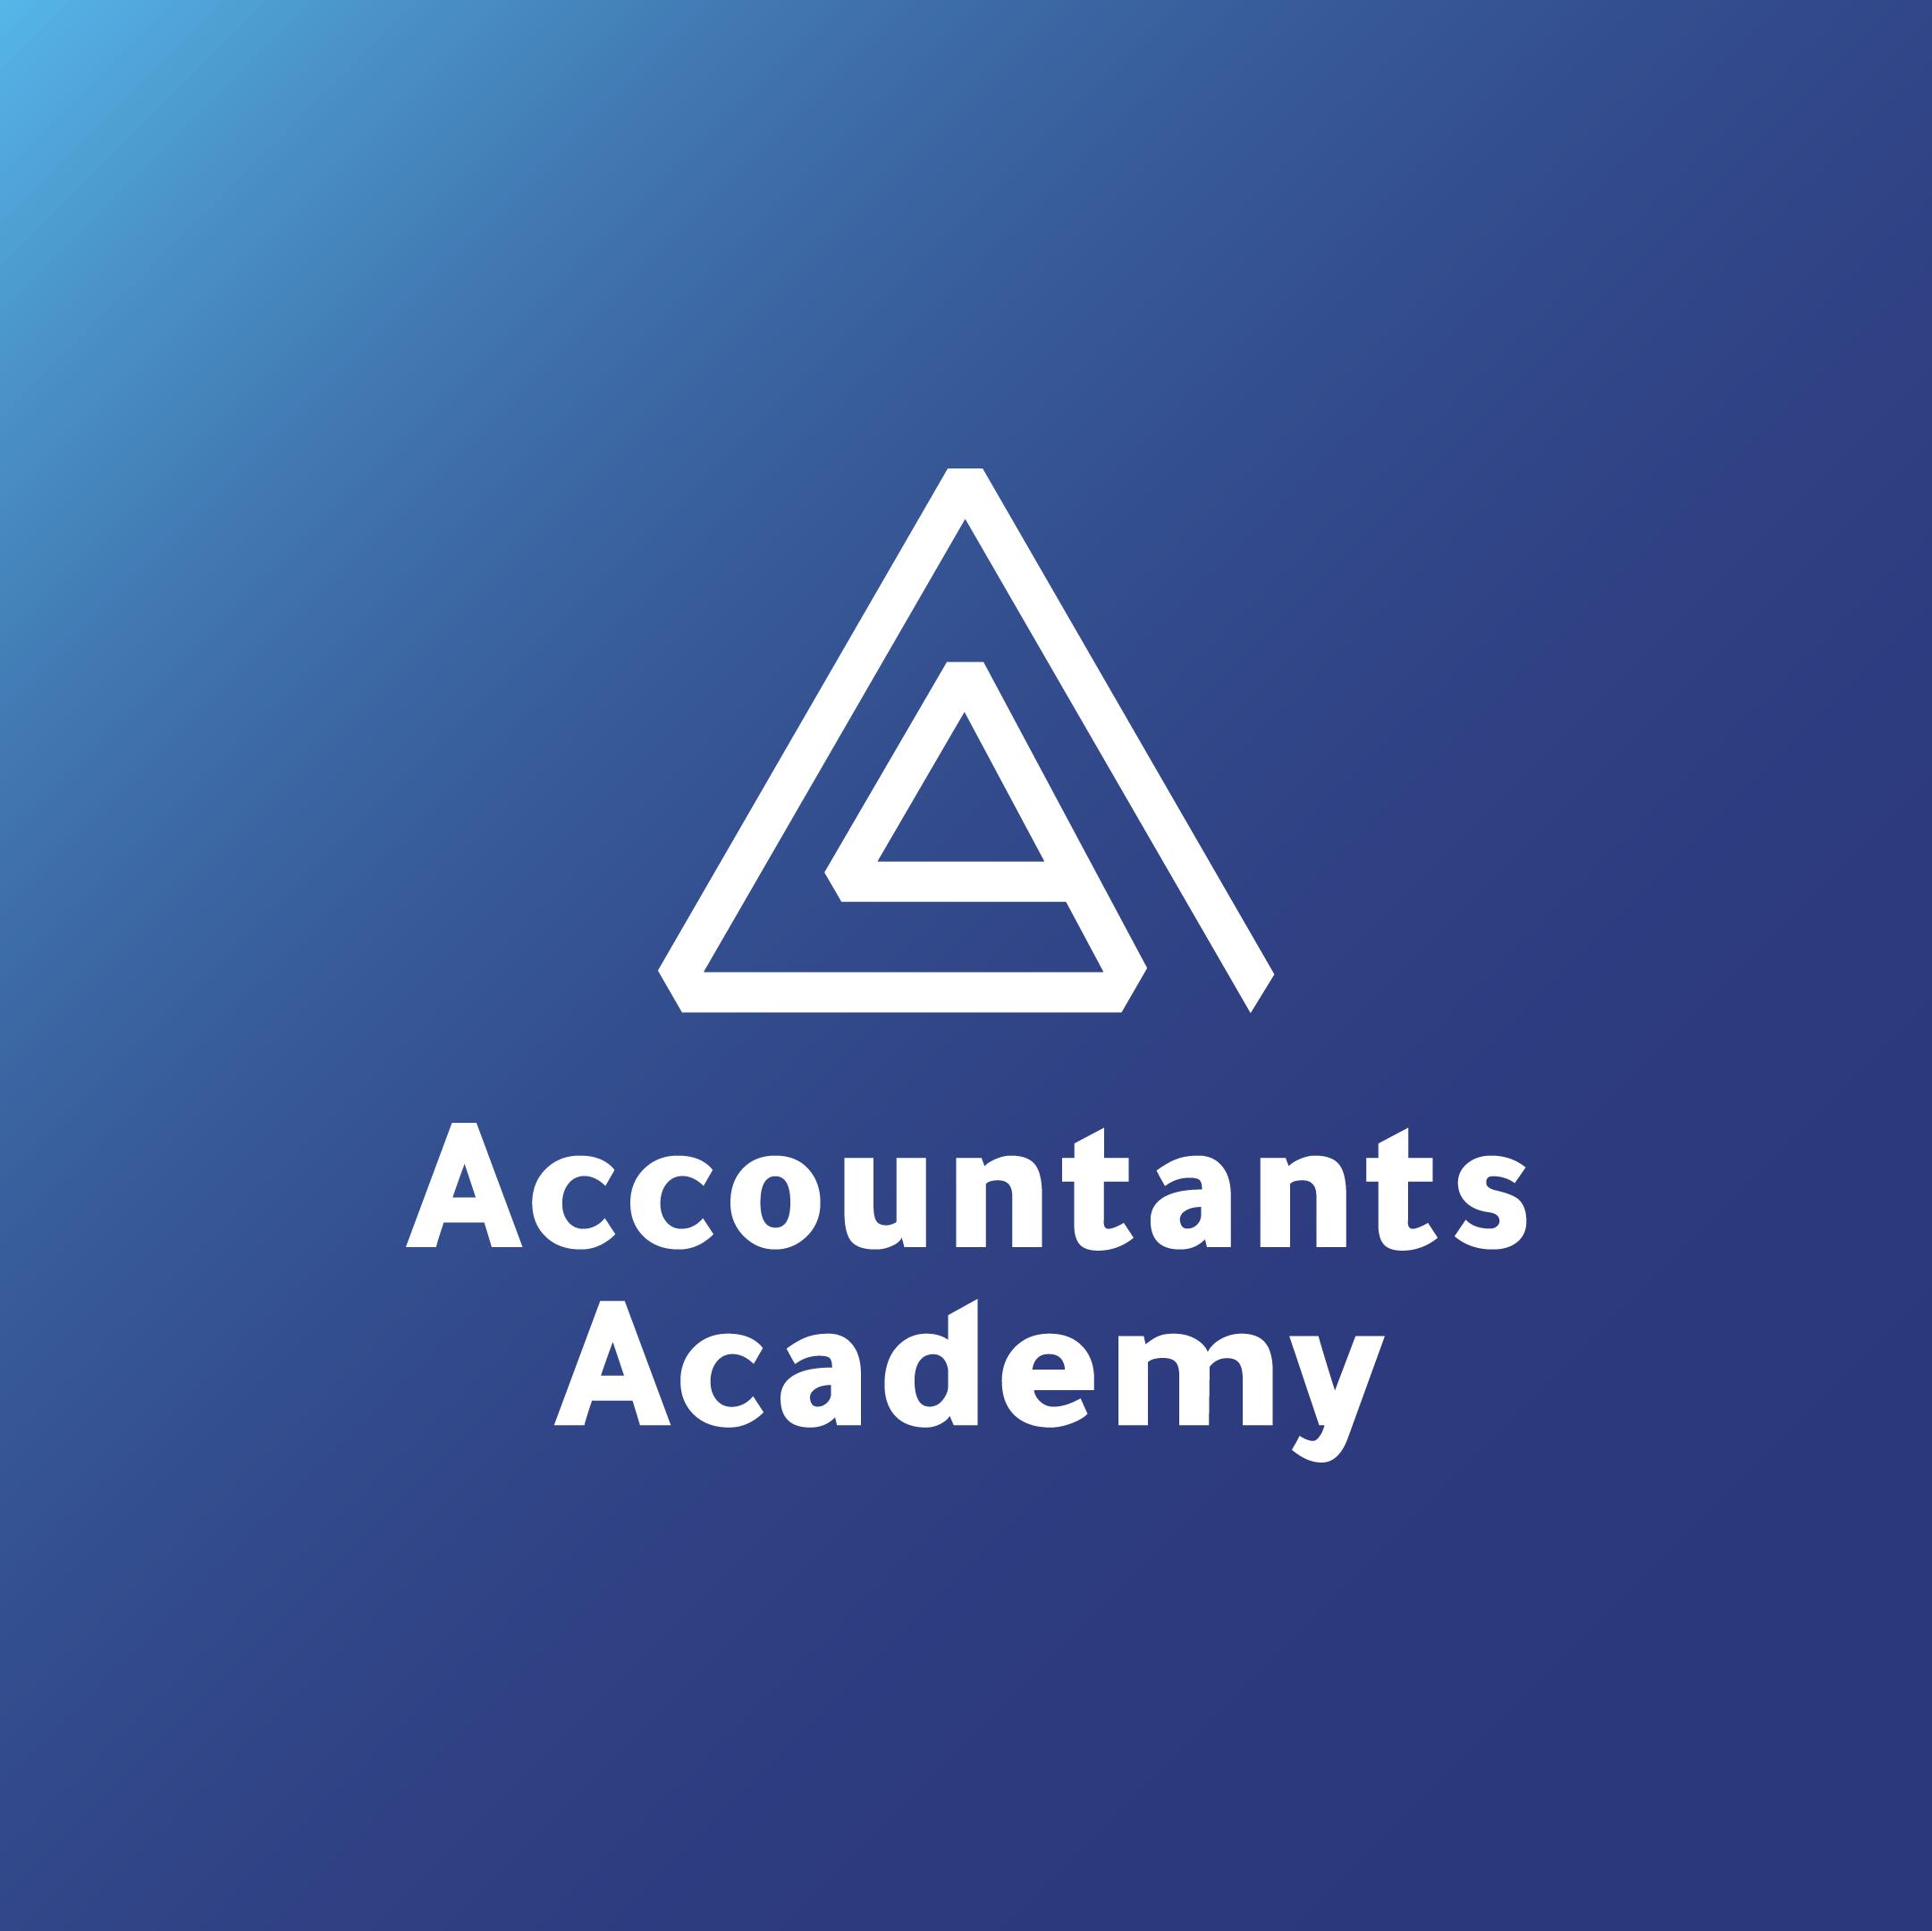 Logo Accountants Academy